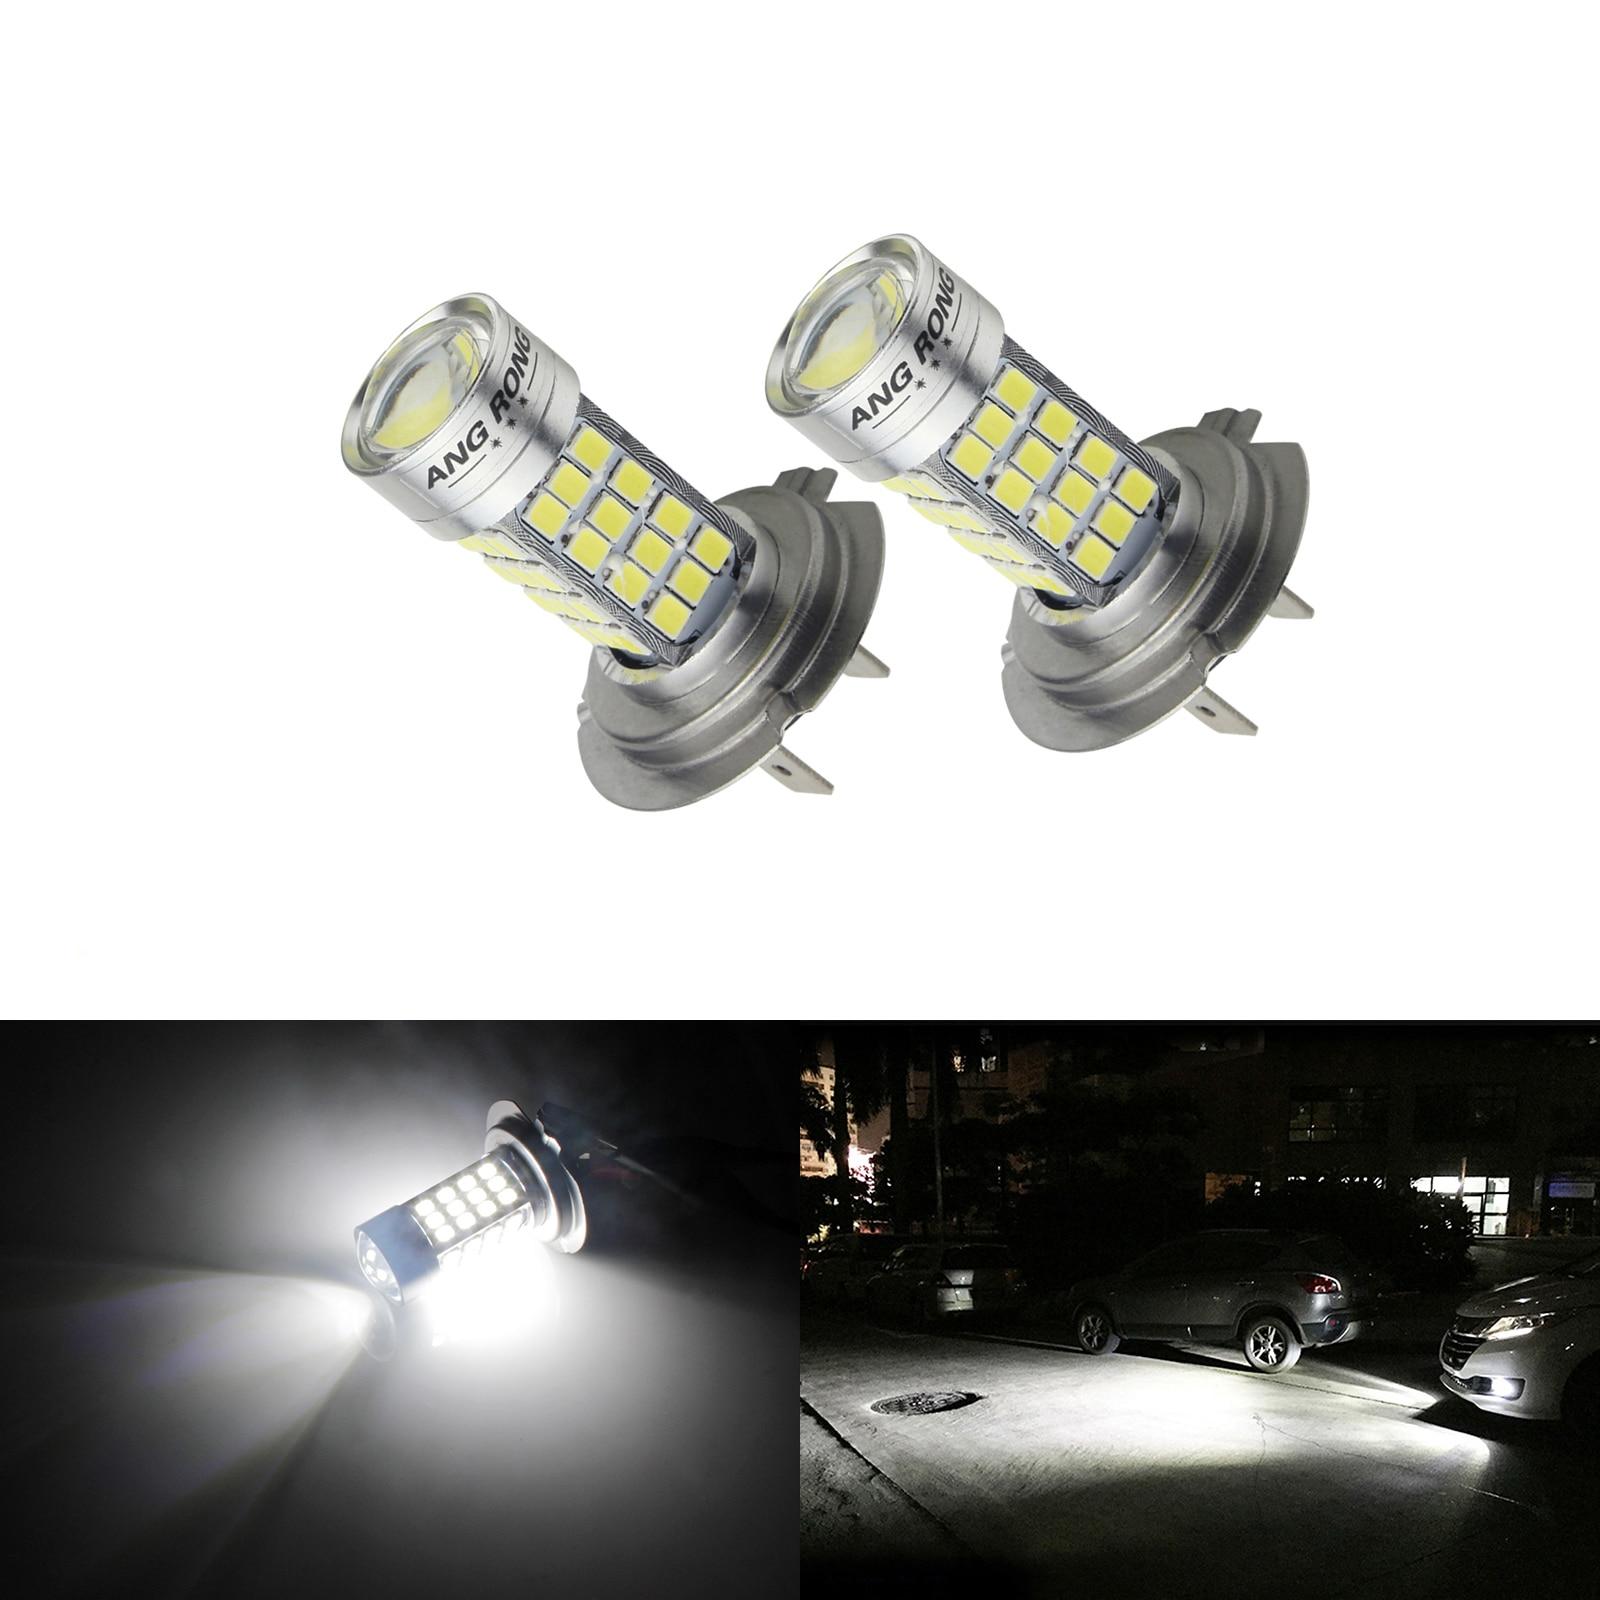 2x 50W H11 H8 H9 High Power 12V 6000K Xenon White LED Fog Lights Driving Bulbs